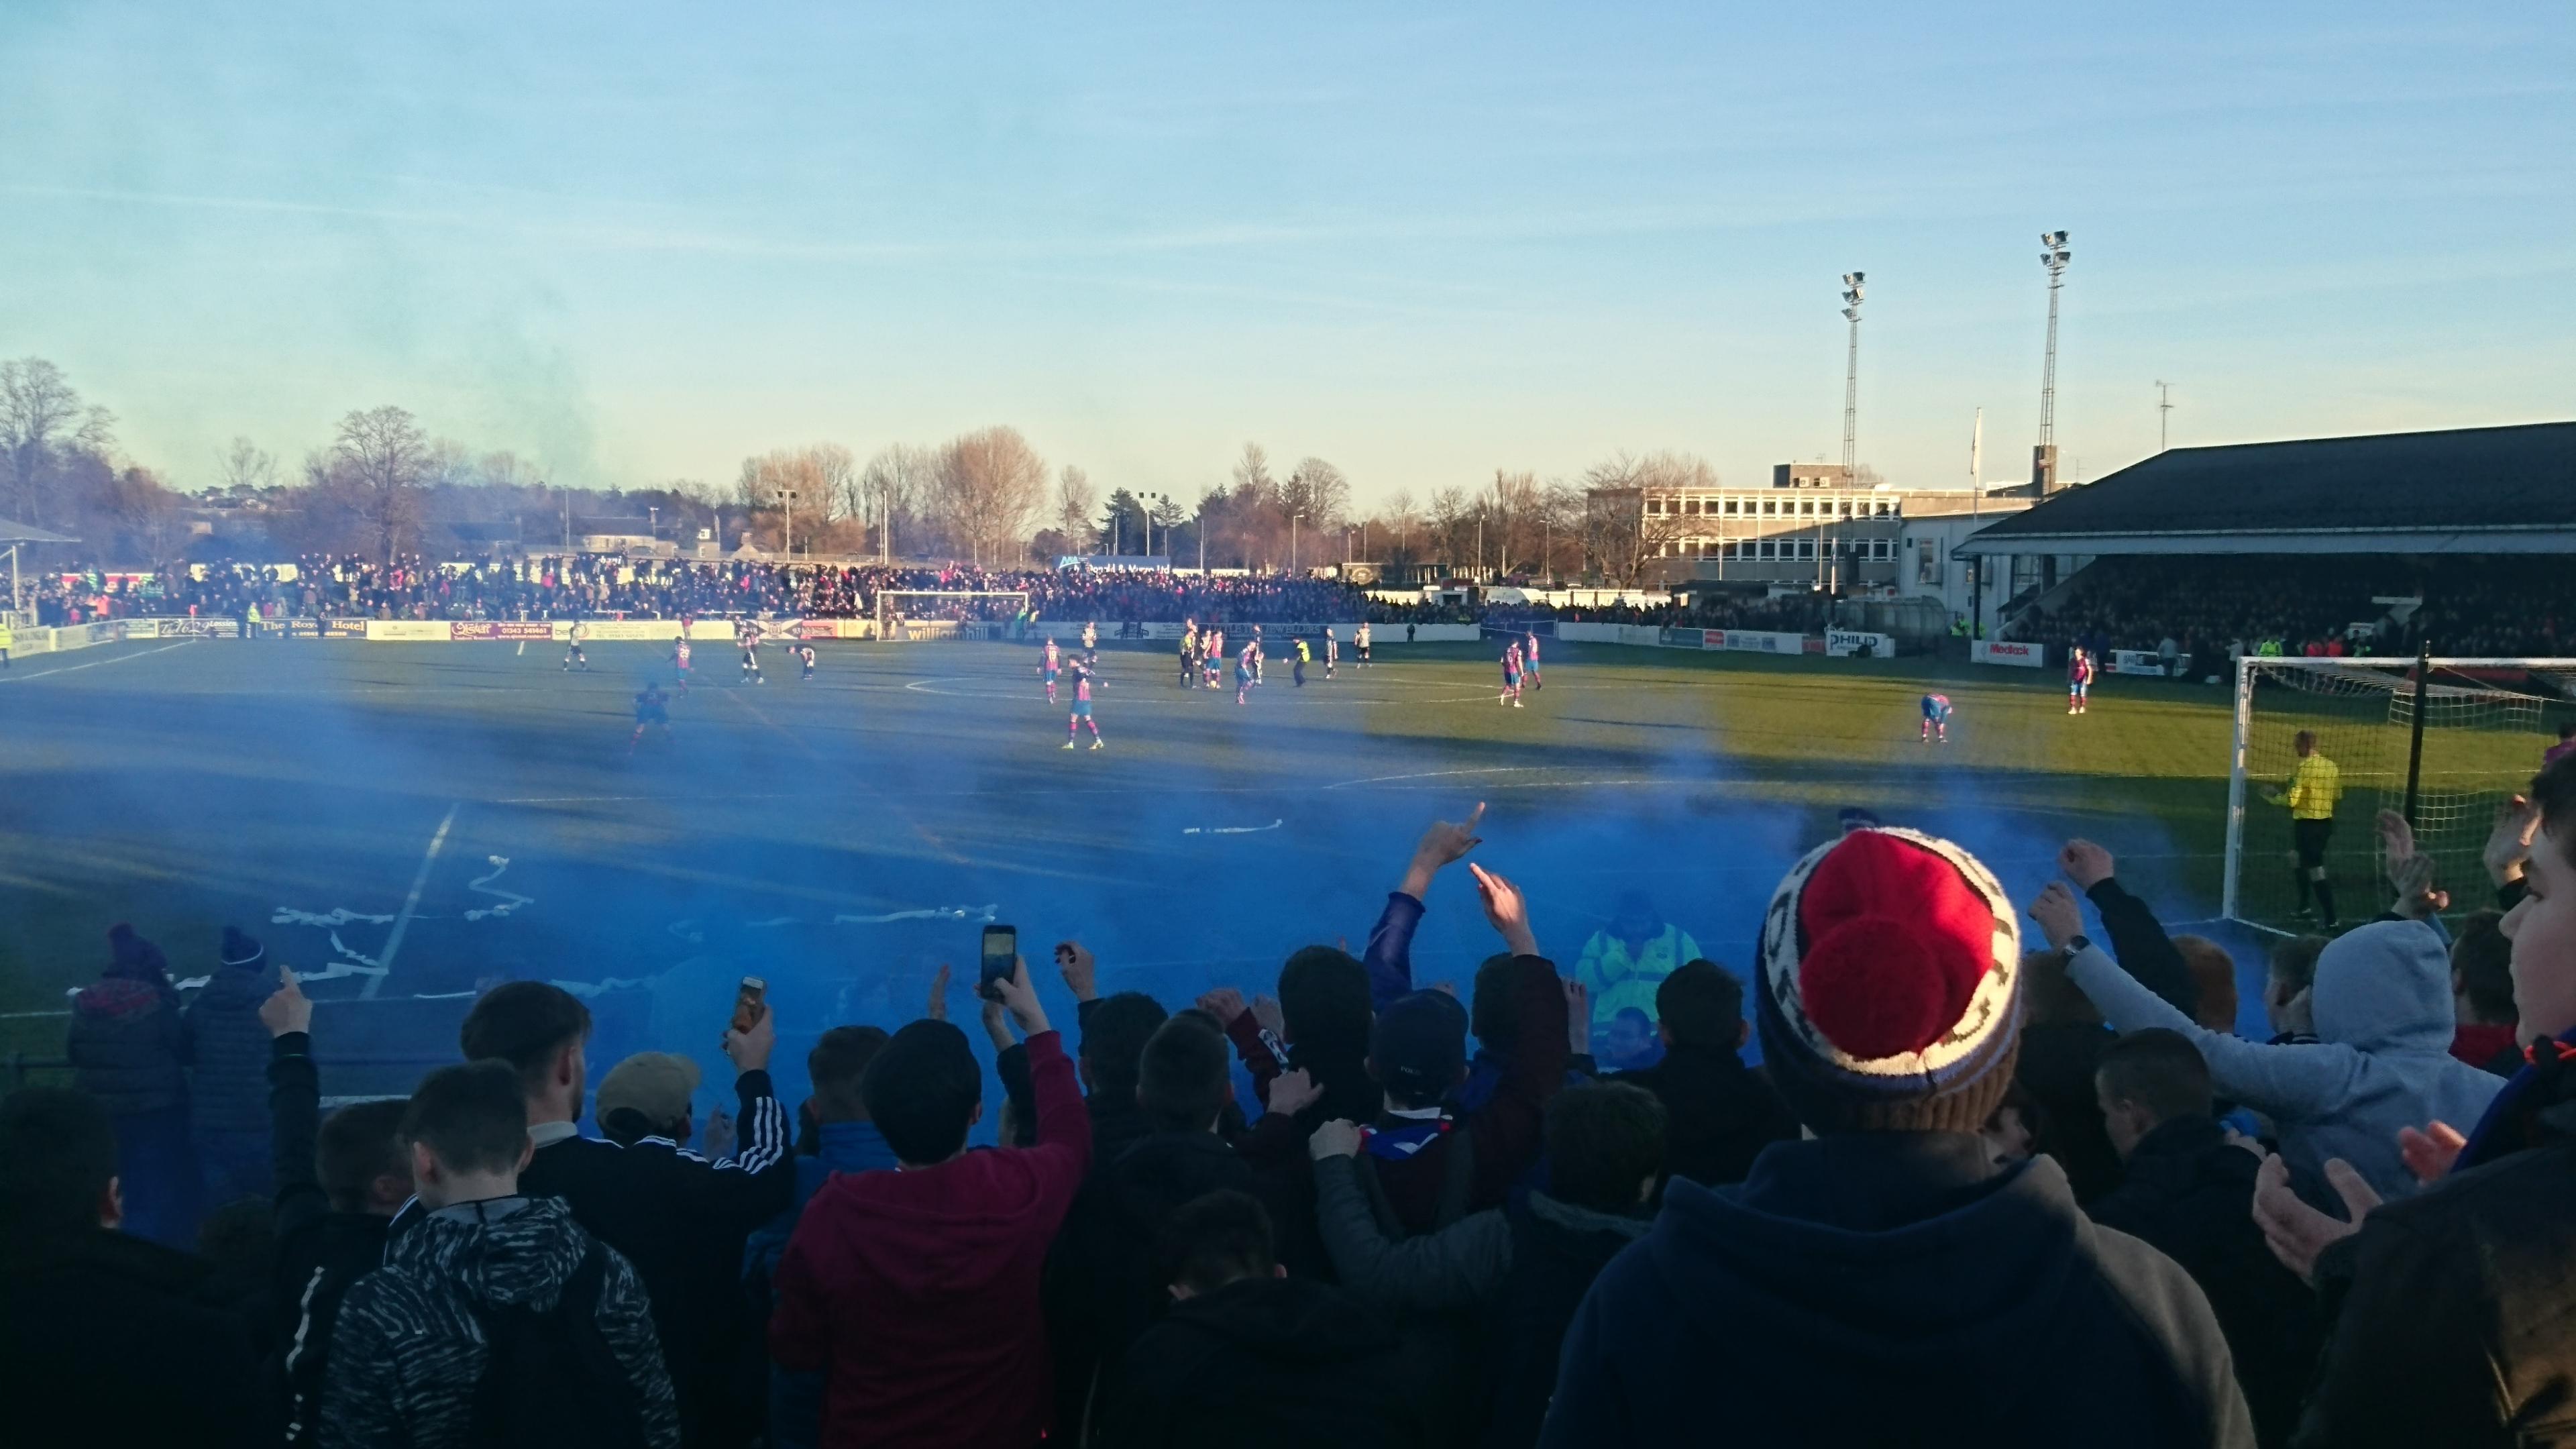 I Grandi Vecchi Stadi D Italia Football Adventures With